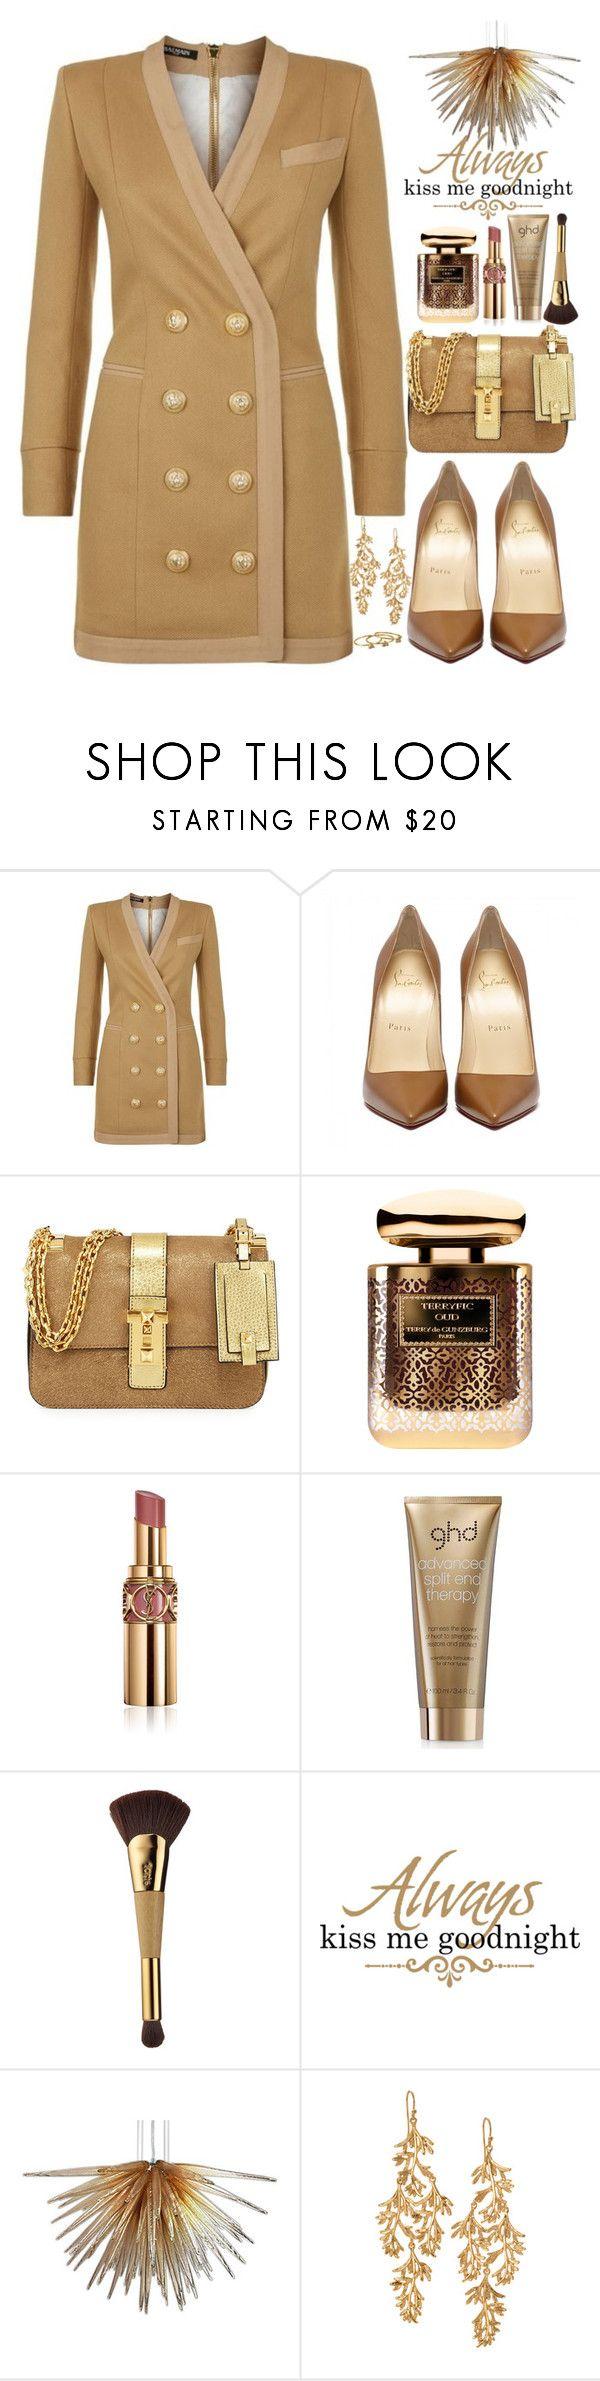 """Brown Short Dress - Balmain"" by bmaroso ❤ liked on Polyvore featuring Balmain, Valentino, Terry de Gunzburg, Yves Saint Laurent, GHD, tarte, Viz Glass, Stella & Dot and Gorjana"